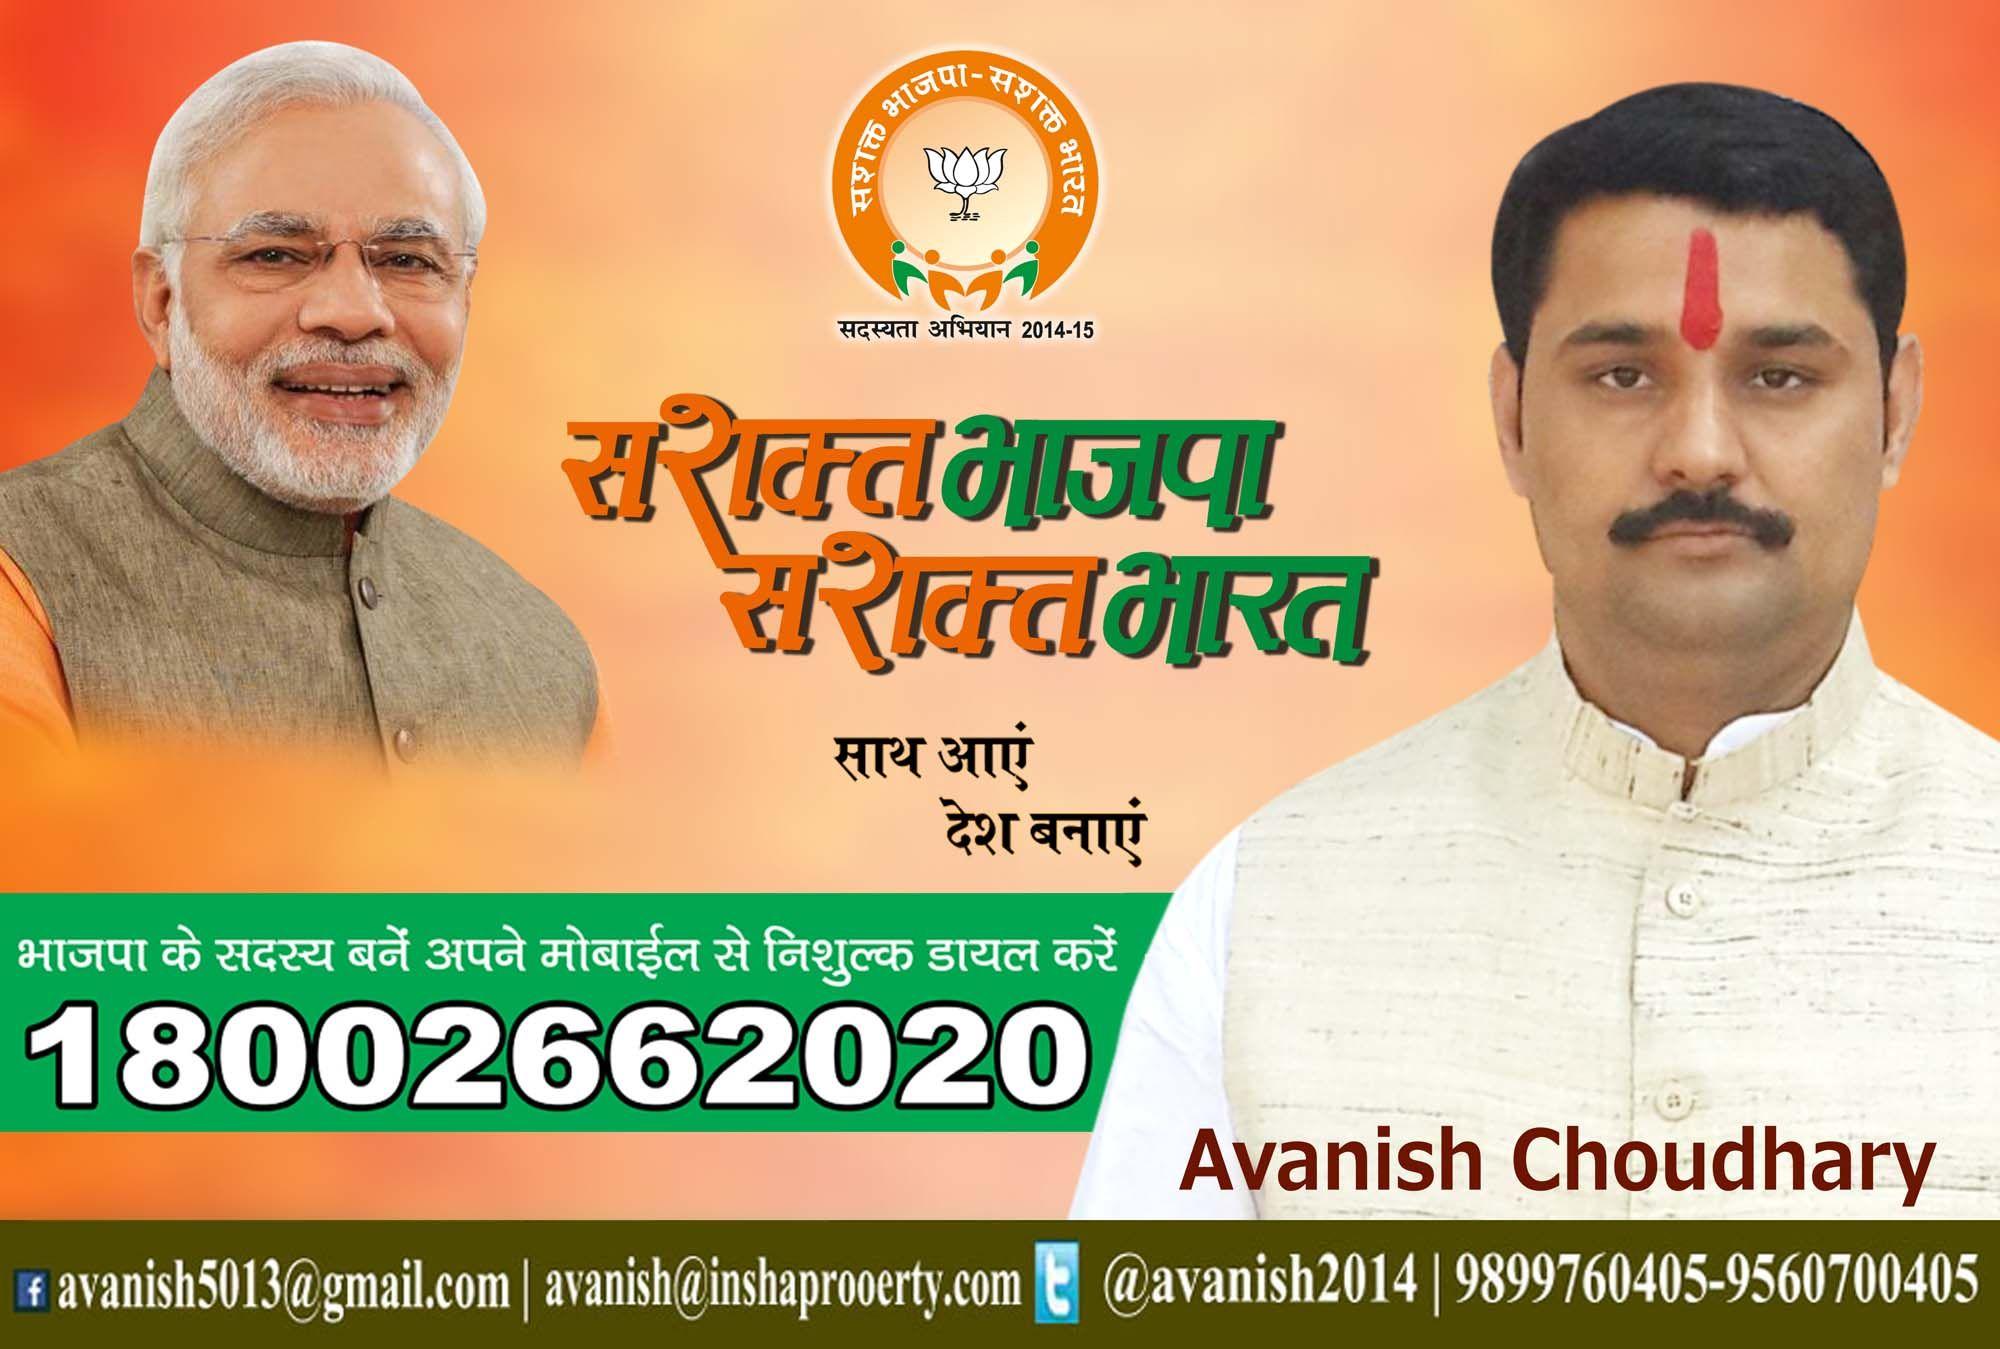 Pin on Avanish Choudhary B.J.P Party